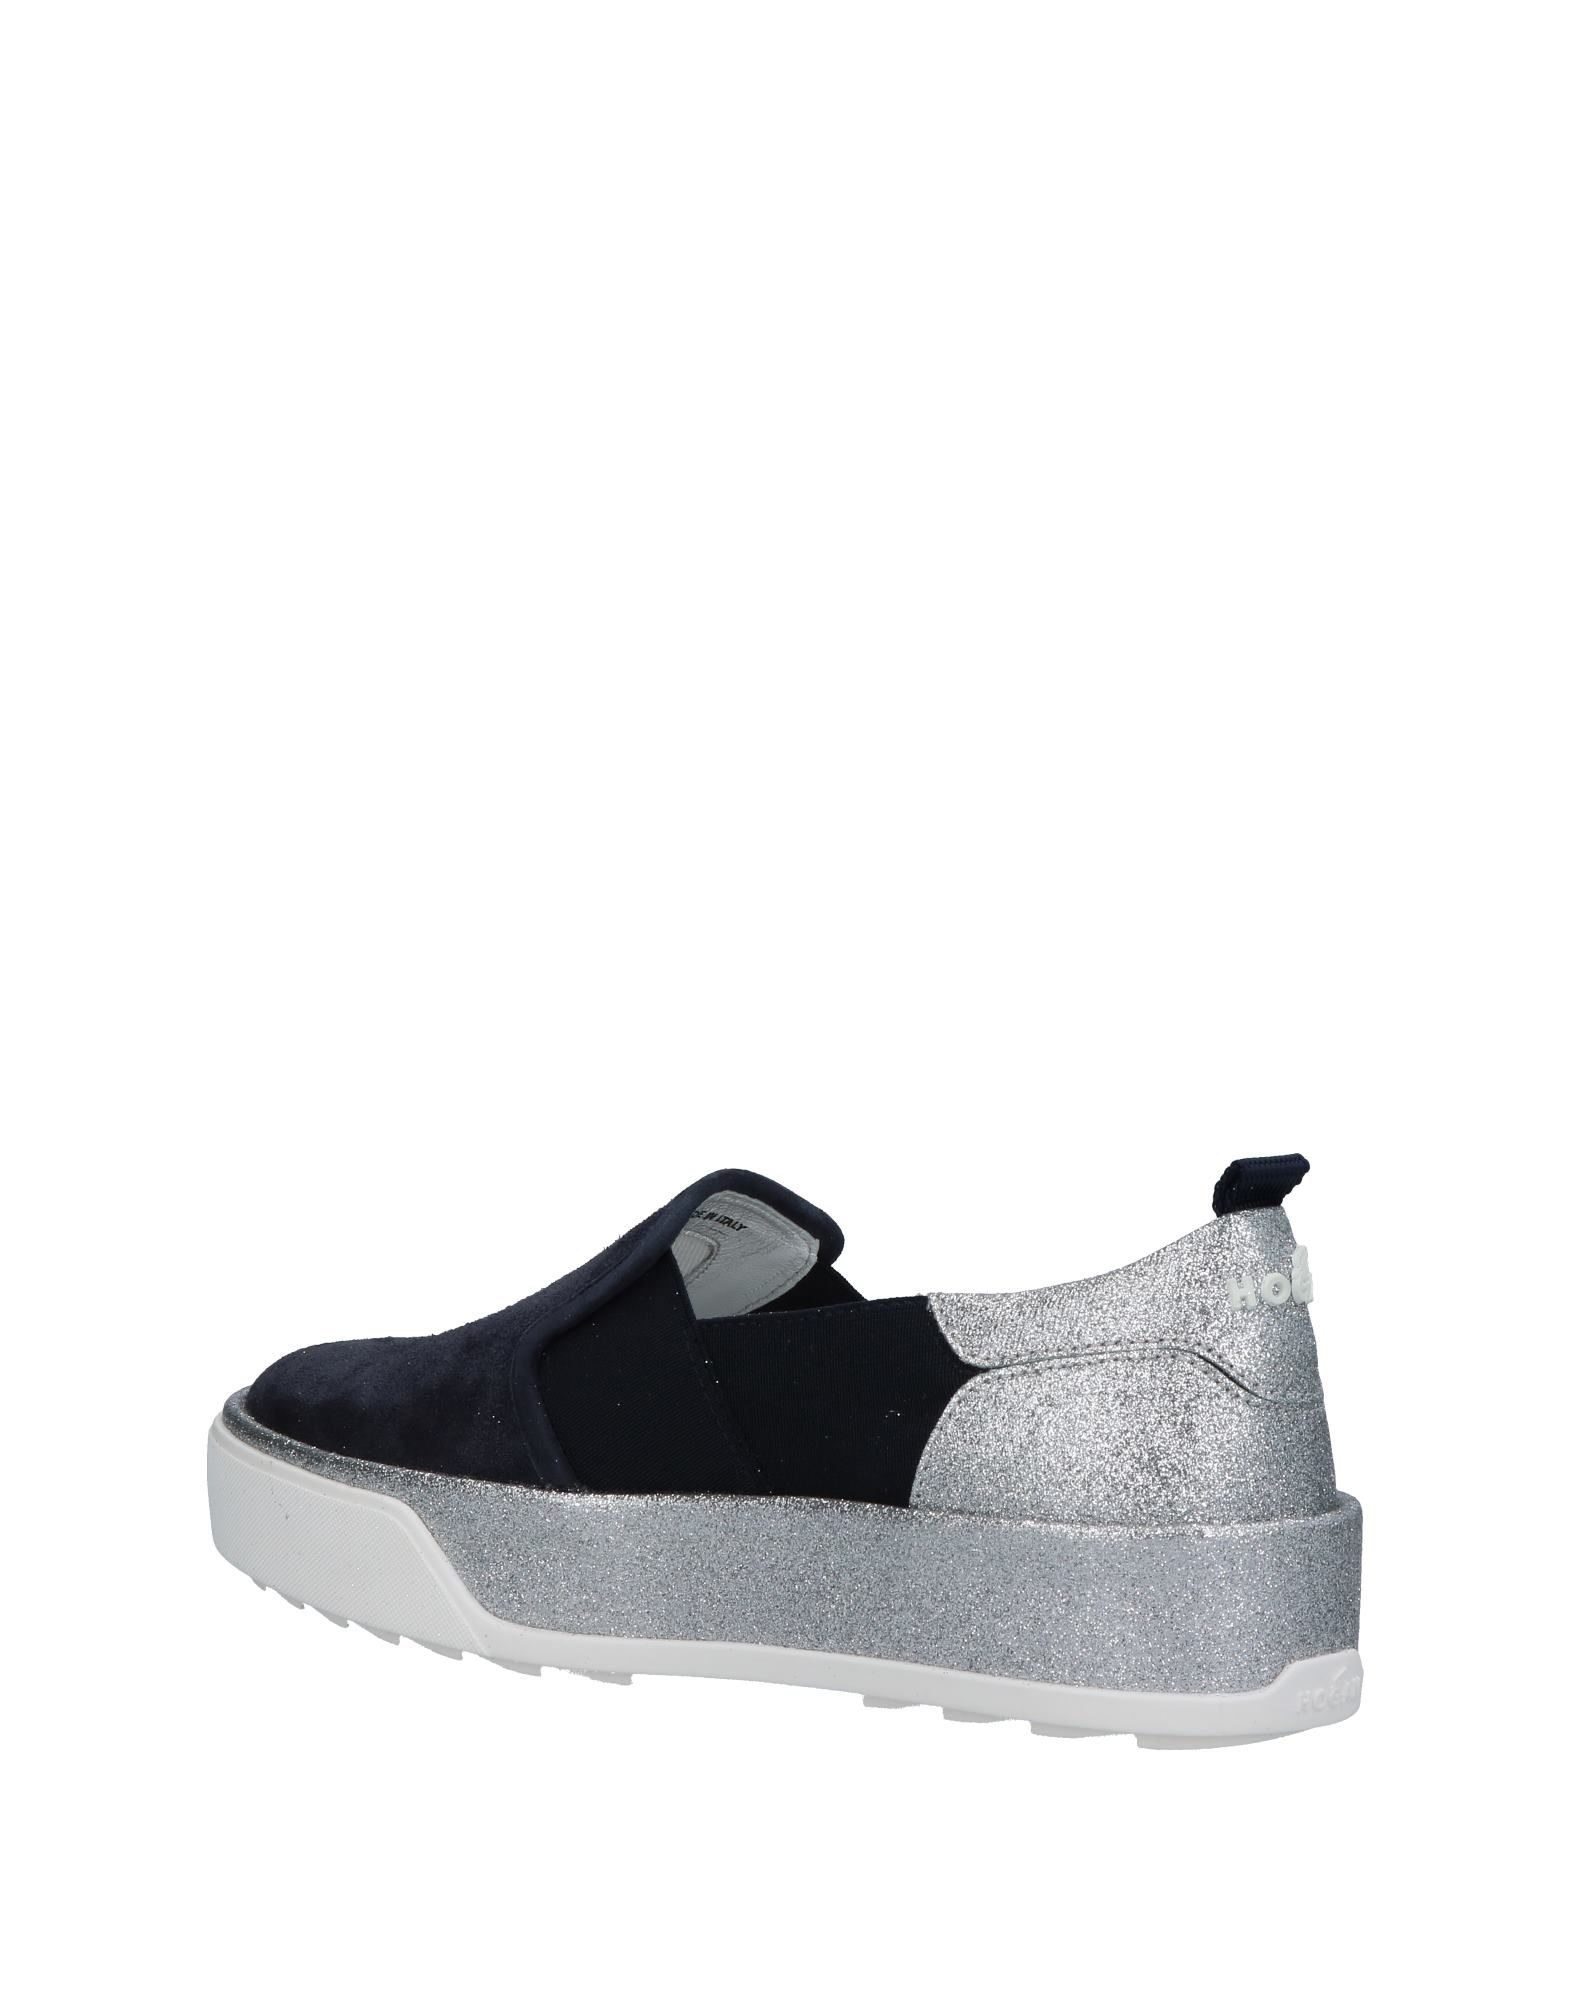 Gut Rebel um billige Schuhe zu tragenHogan Rebel Gut Sneakers Damen  11392699XM 0ca0f8